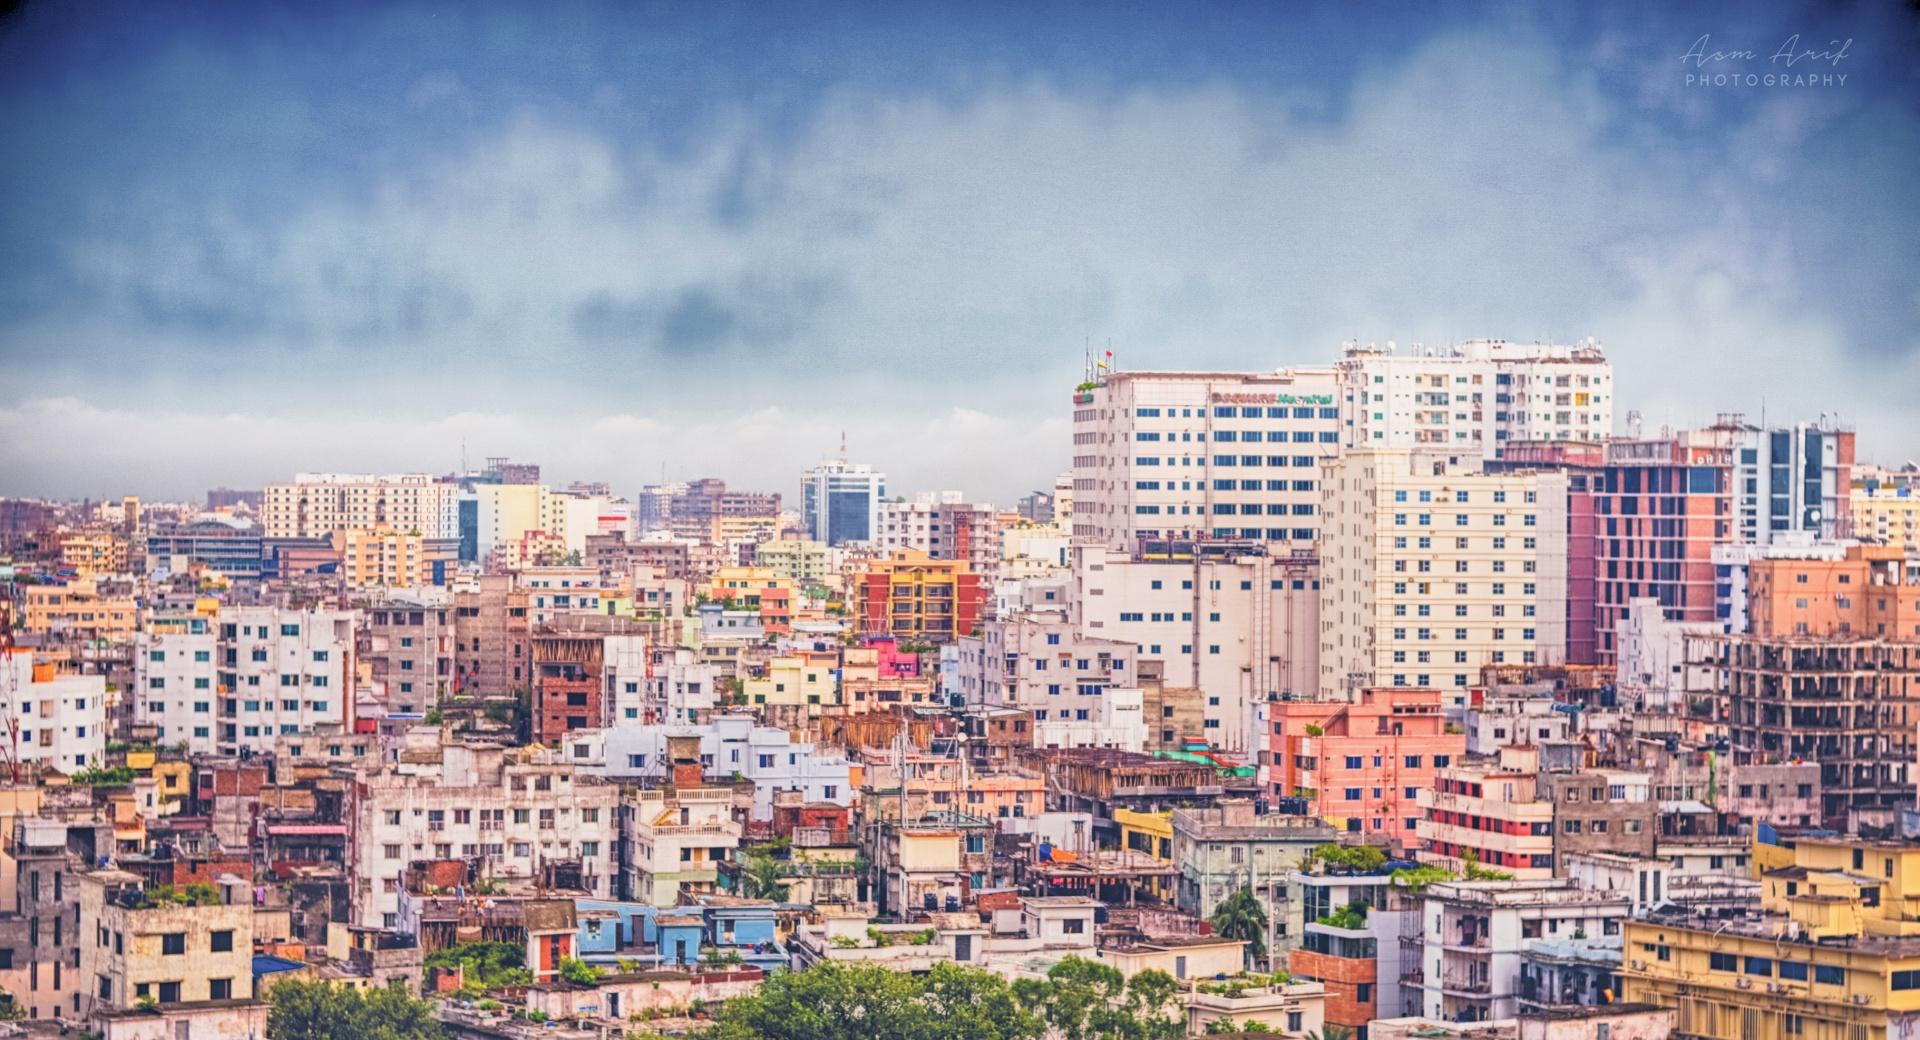 Dhaka City wallpapers HD quality